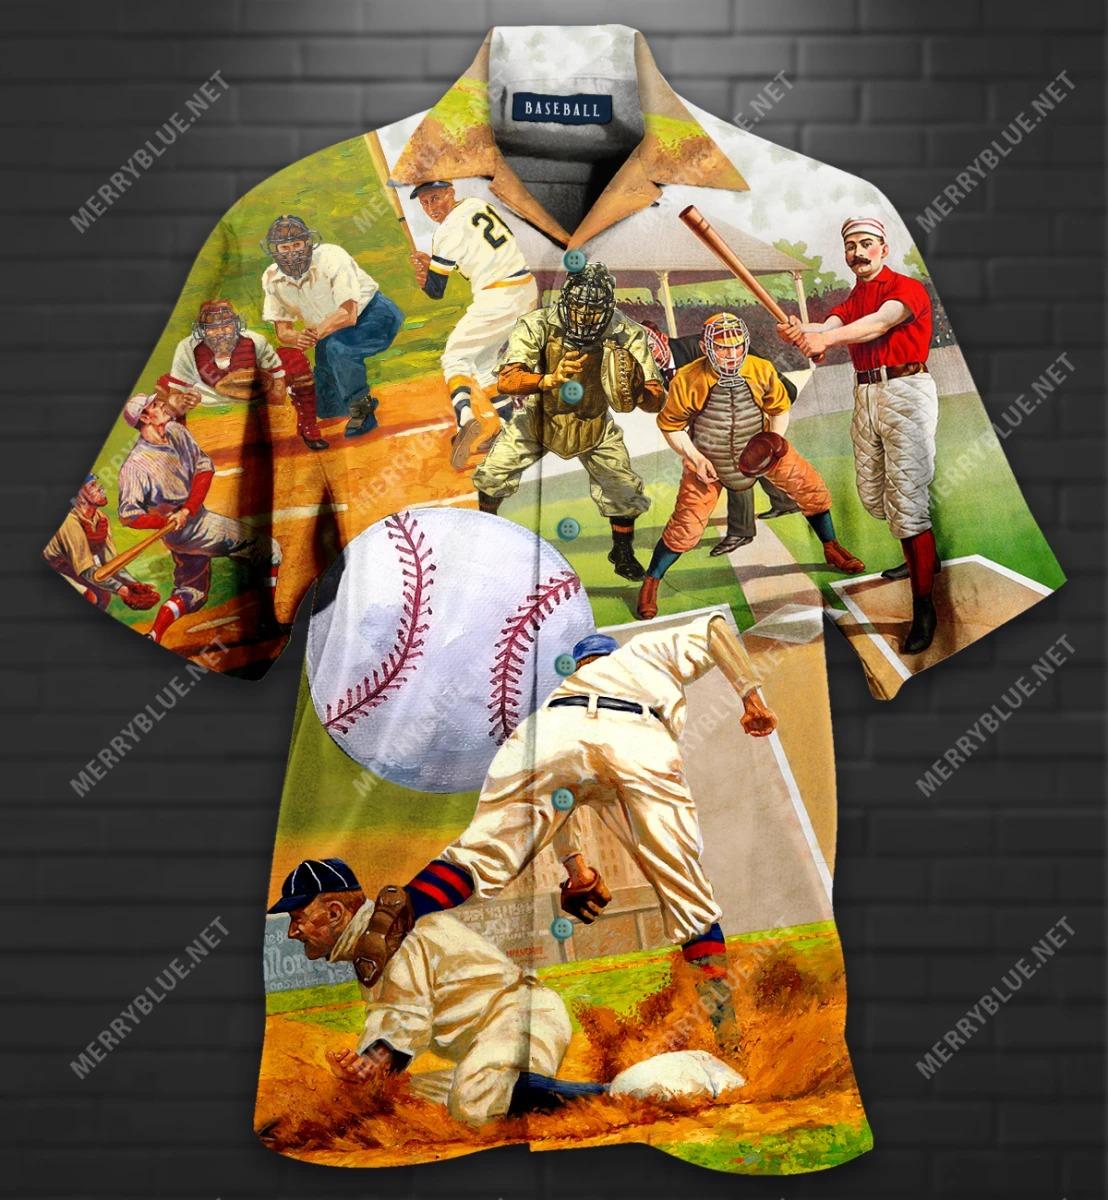 Playing Baseball Short Sleeve Shirt 1 1